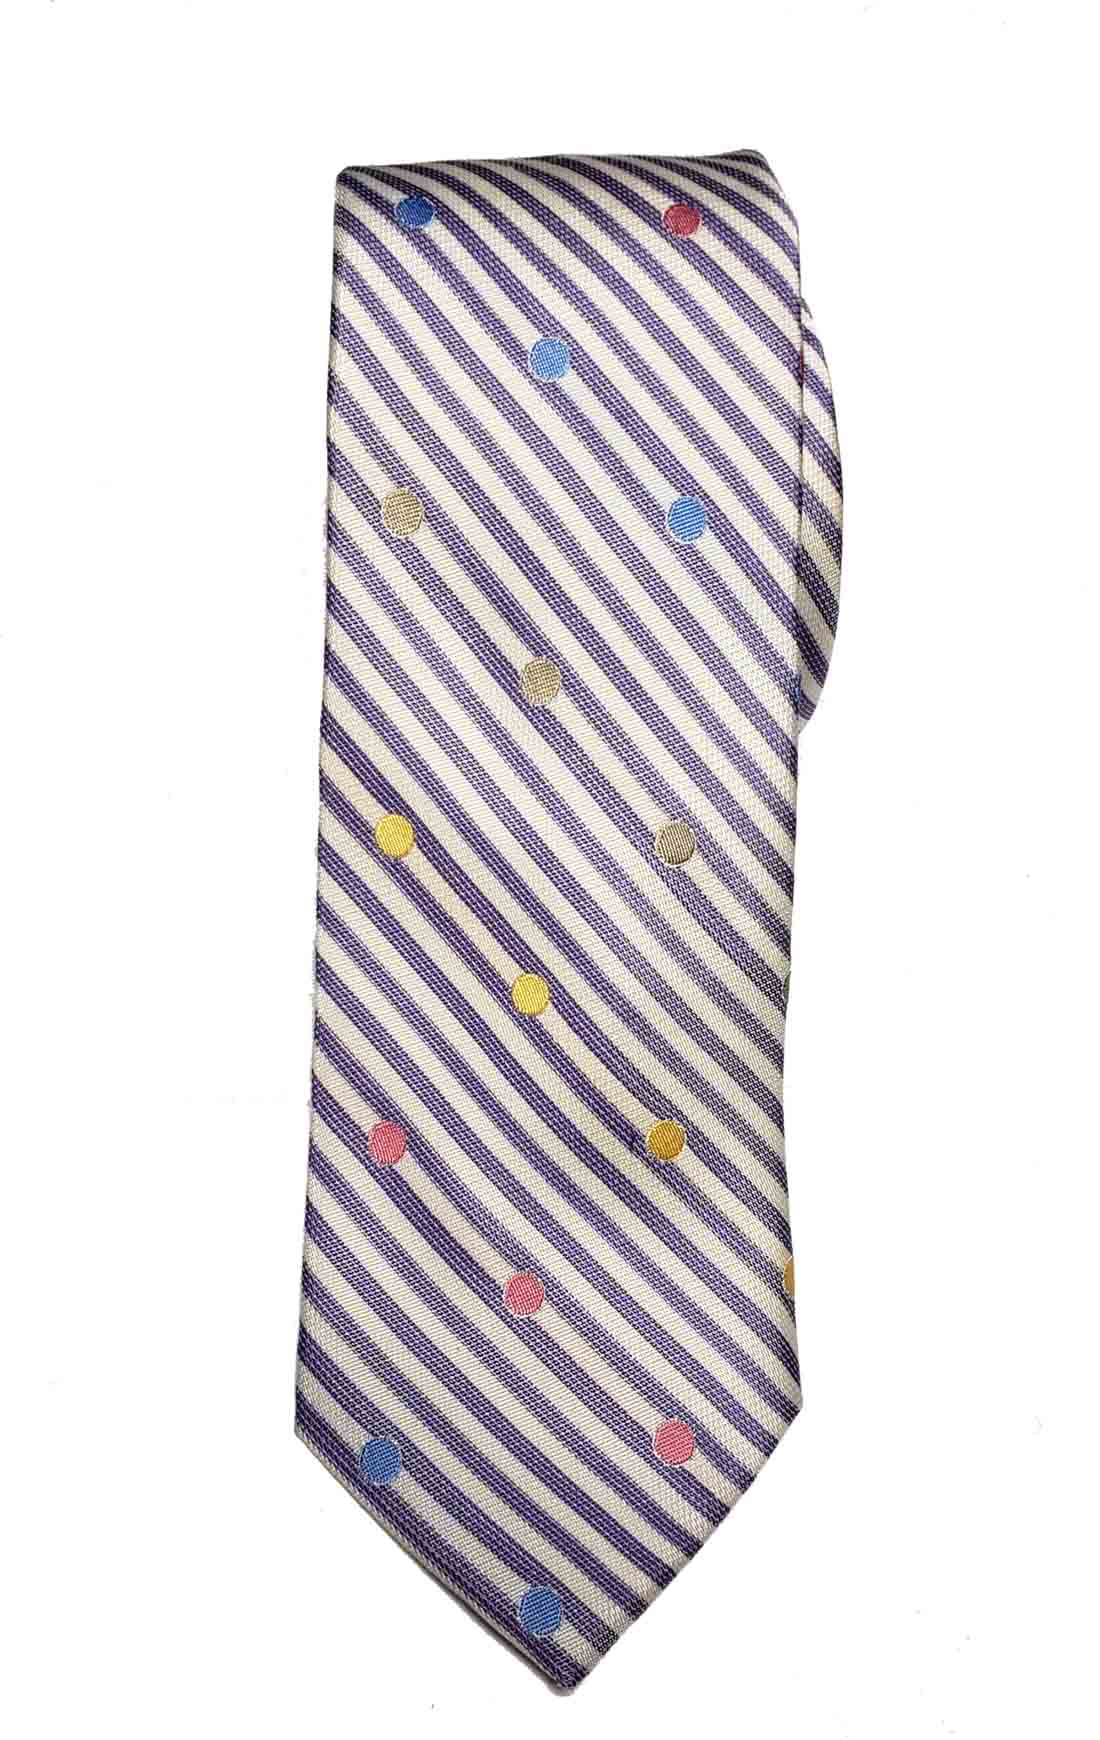 Nick Graham Silk & Cotton Tie Striped Polka Dots Men's Narrow